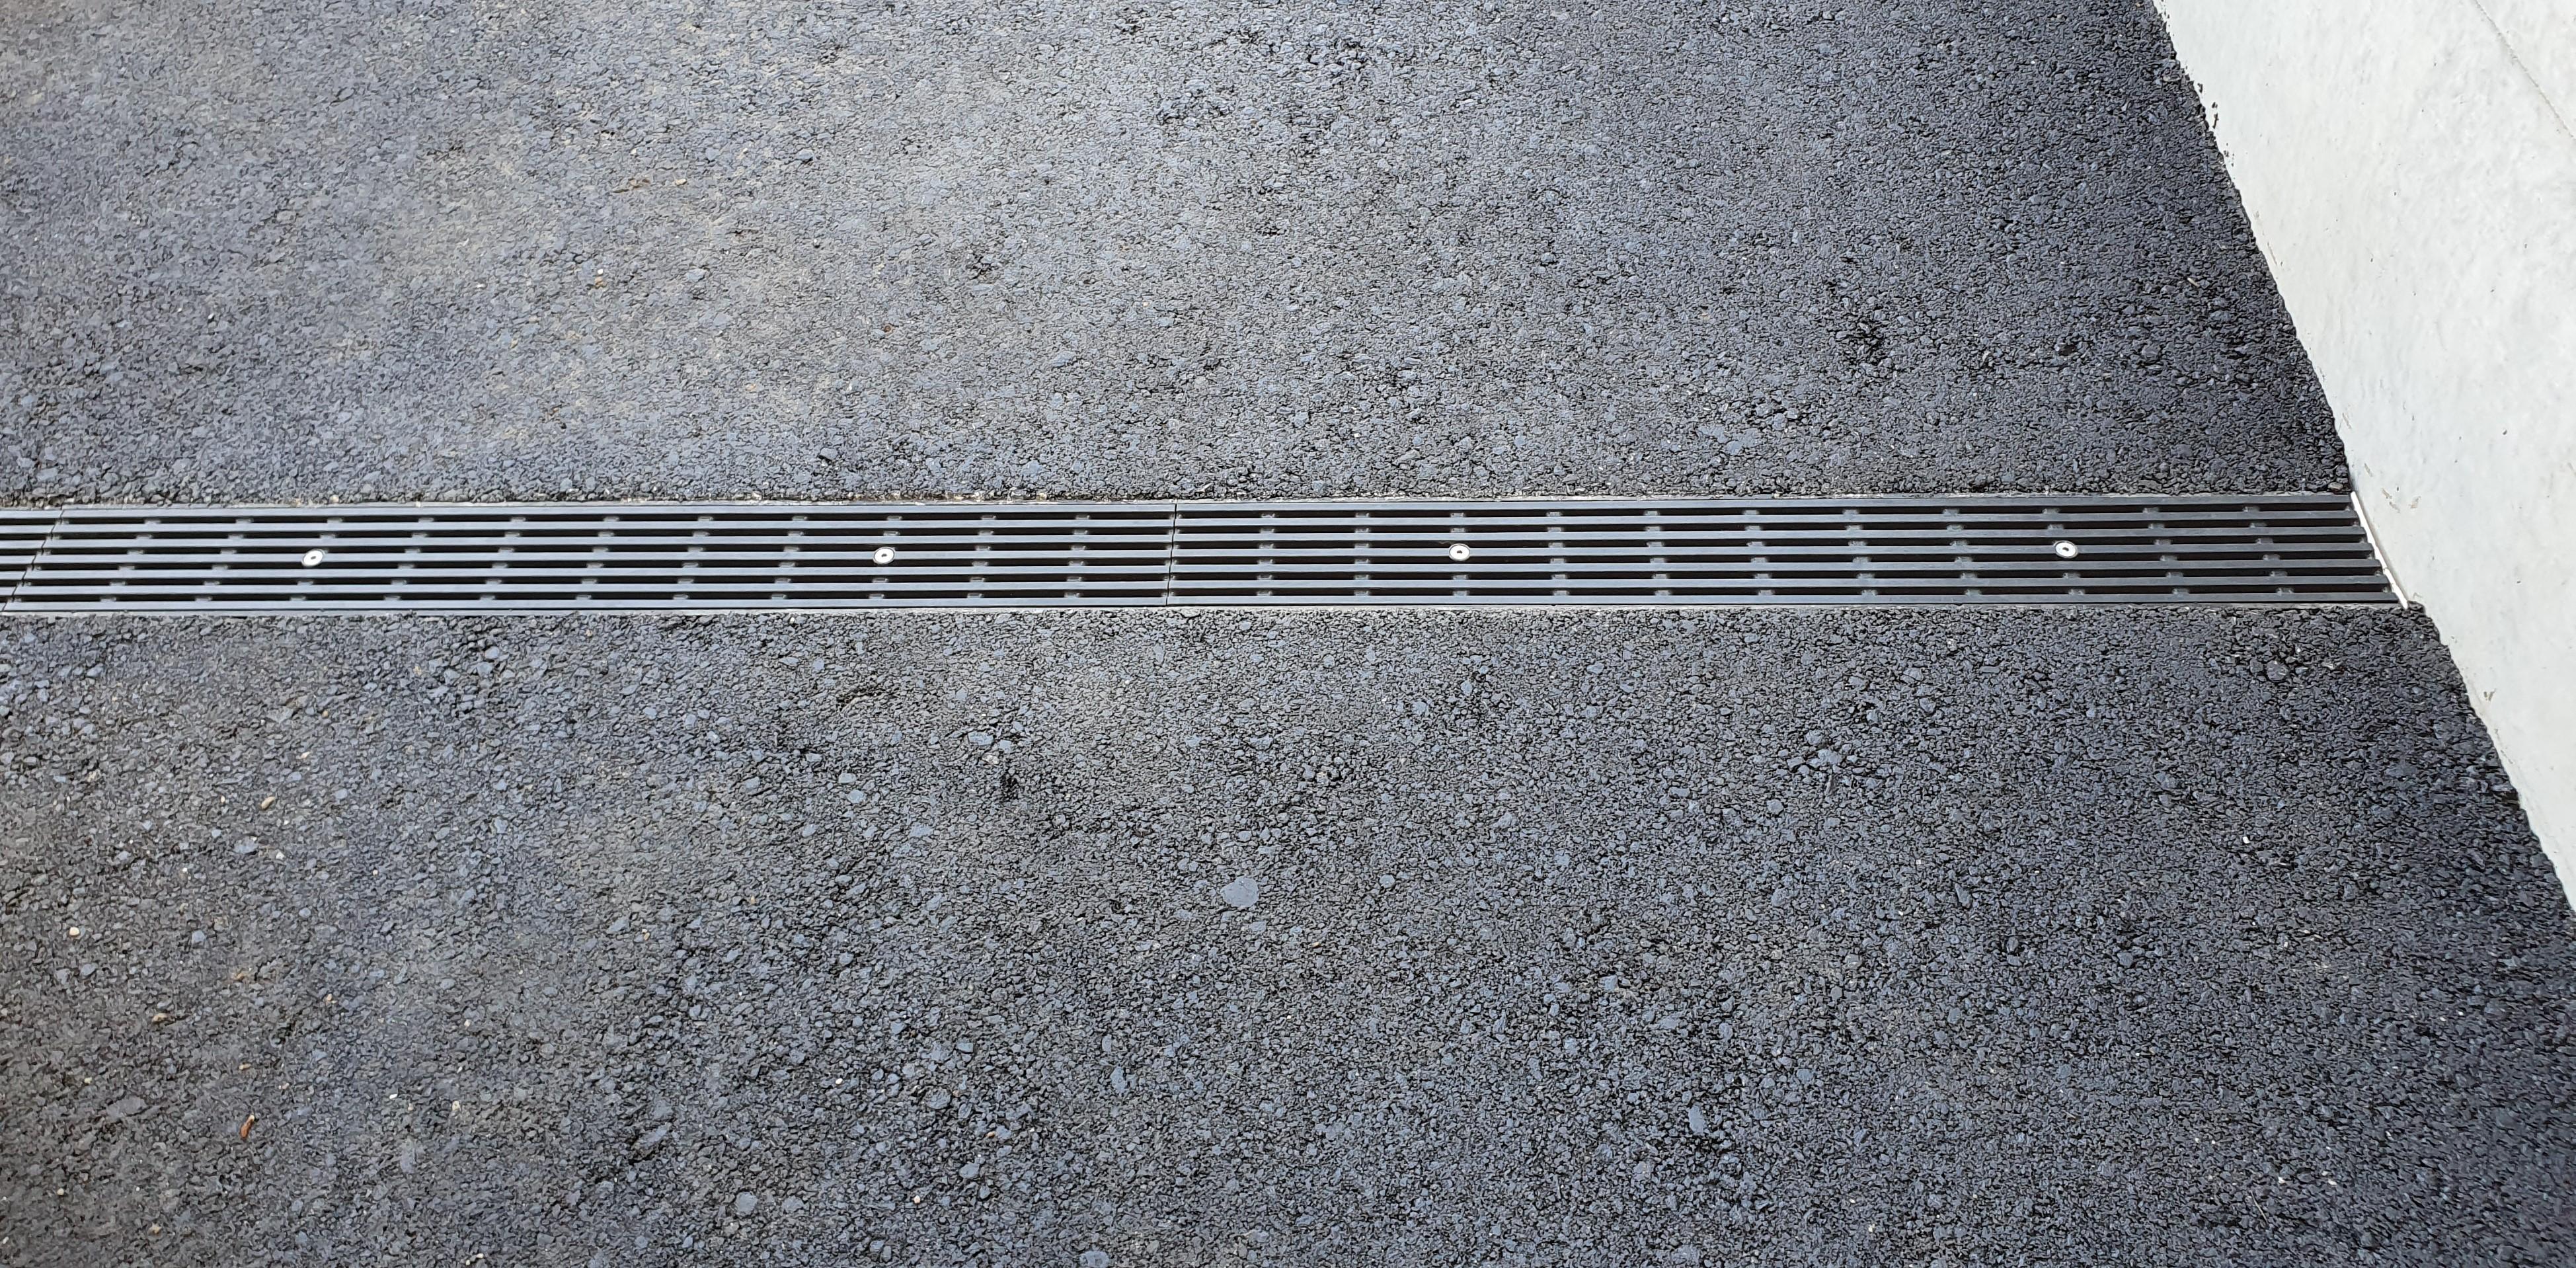 100 V-Line mit GFK Rost (Baustelle Eigen